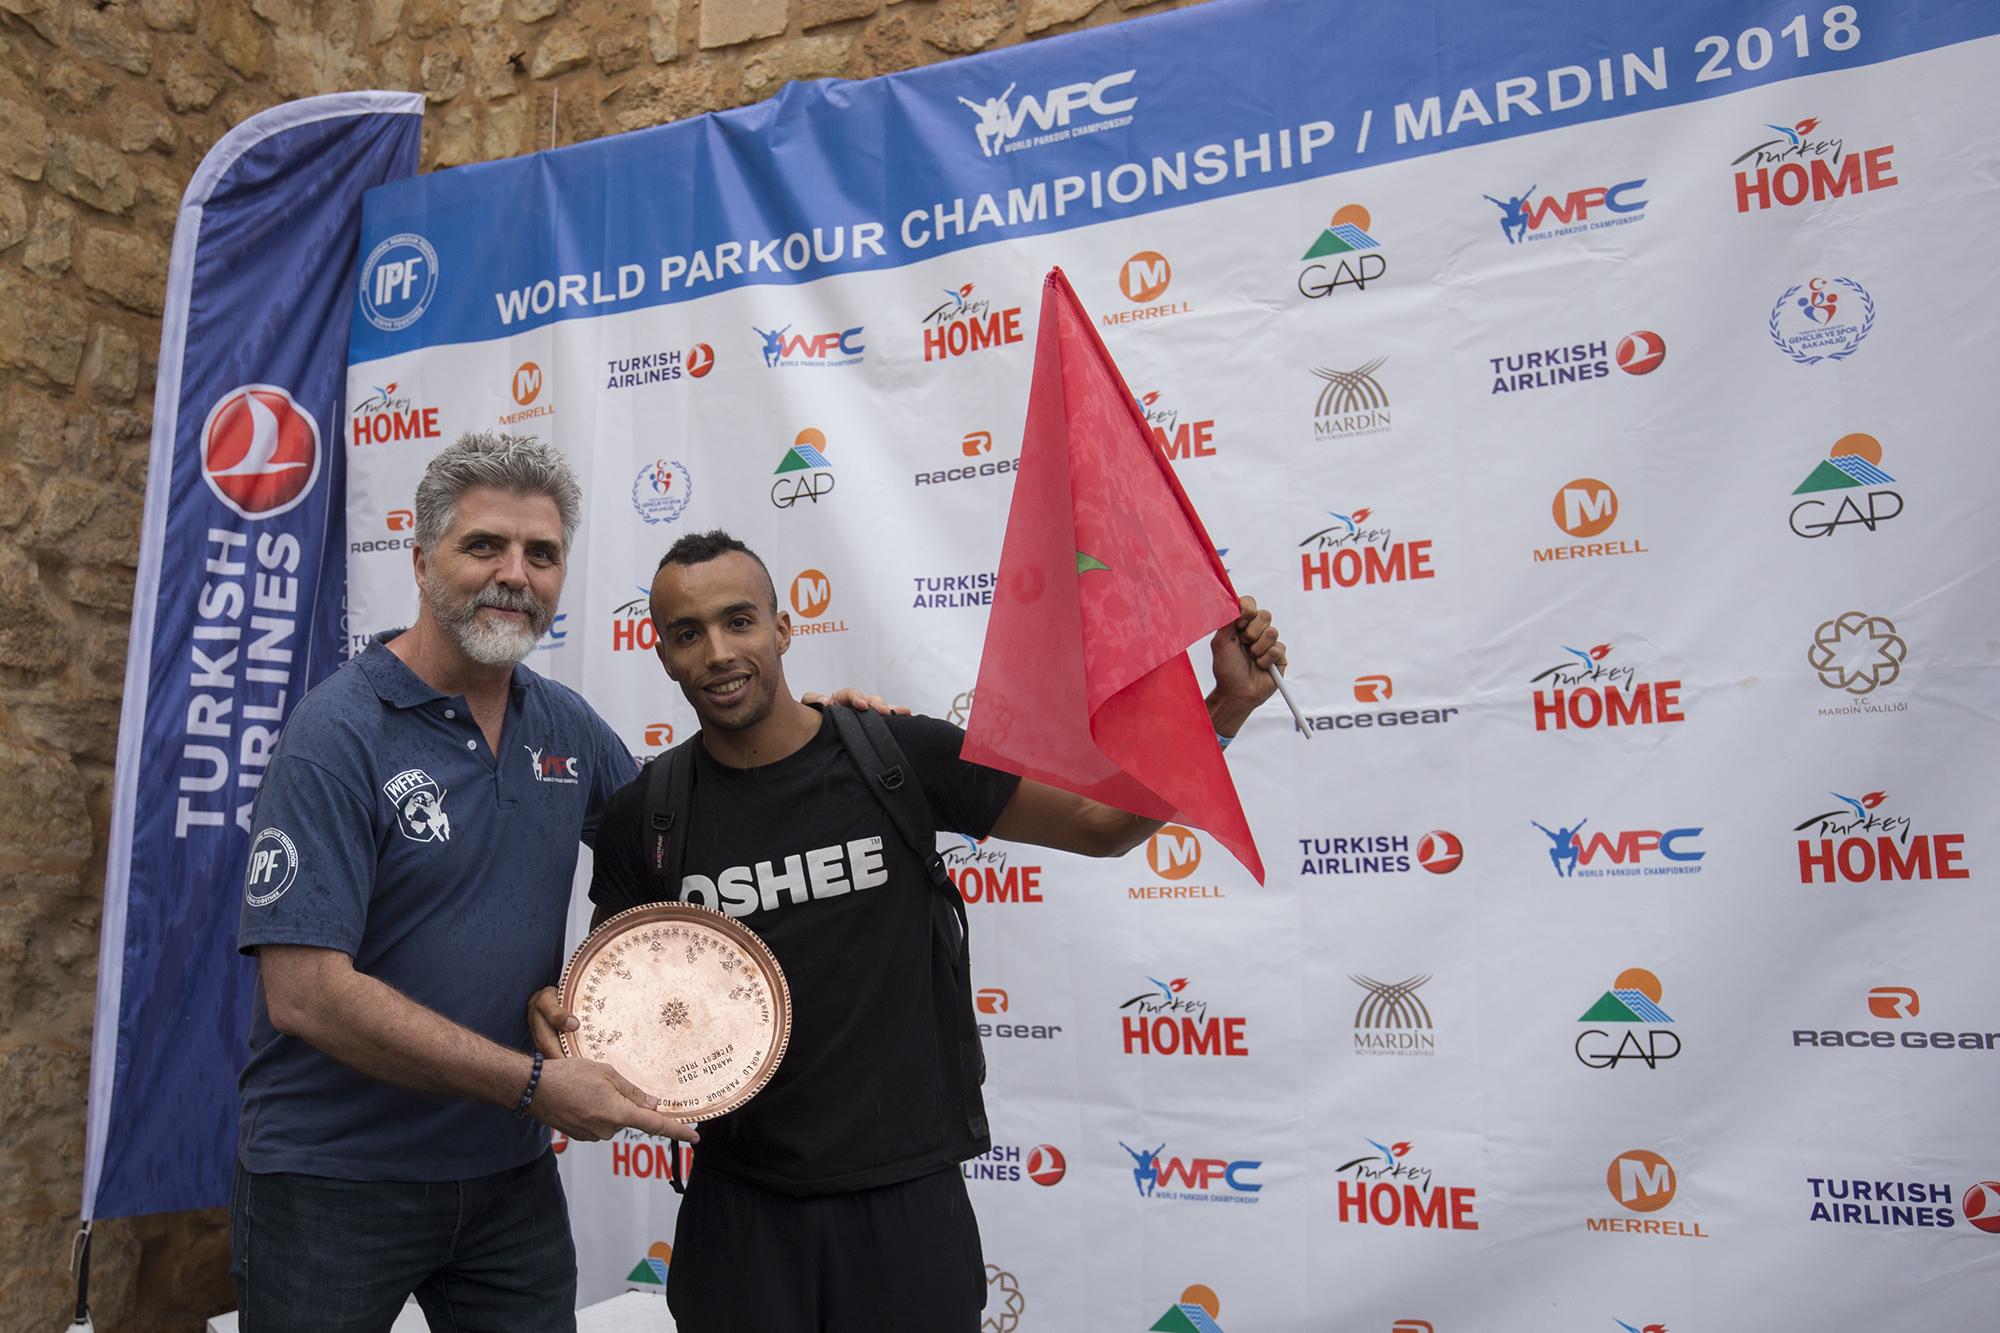 World Parkour Championship Mardin 2018